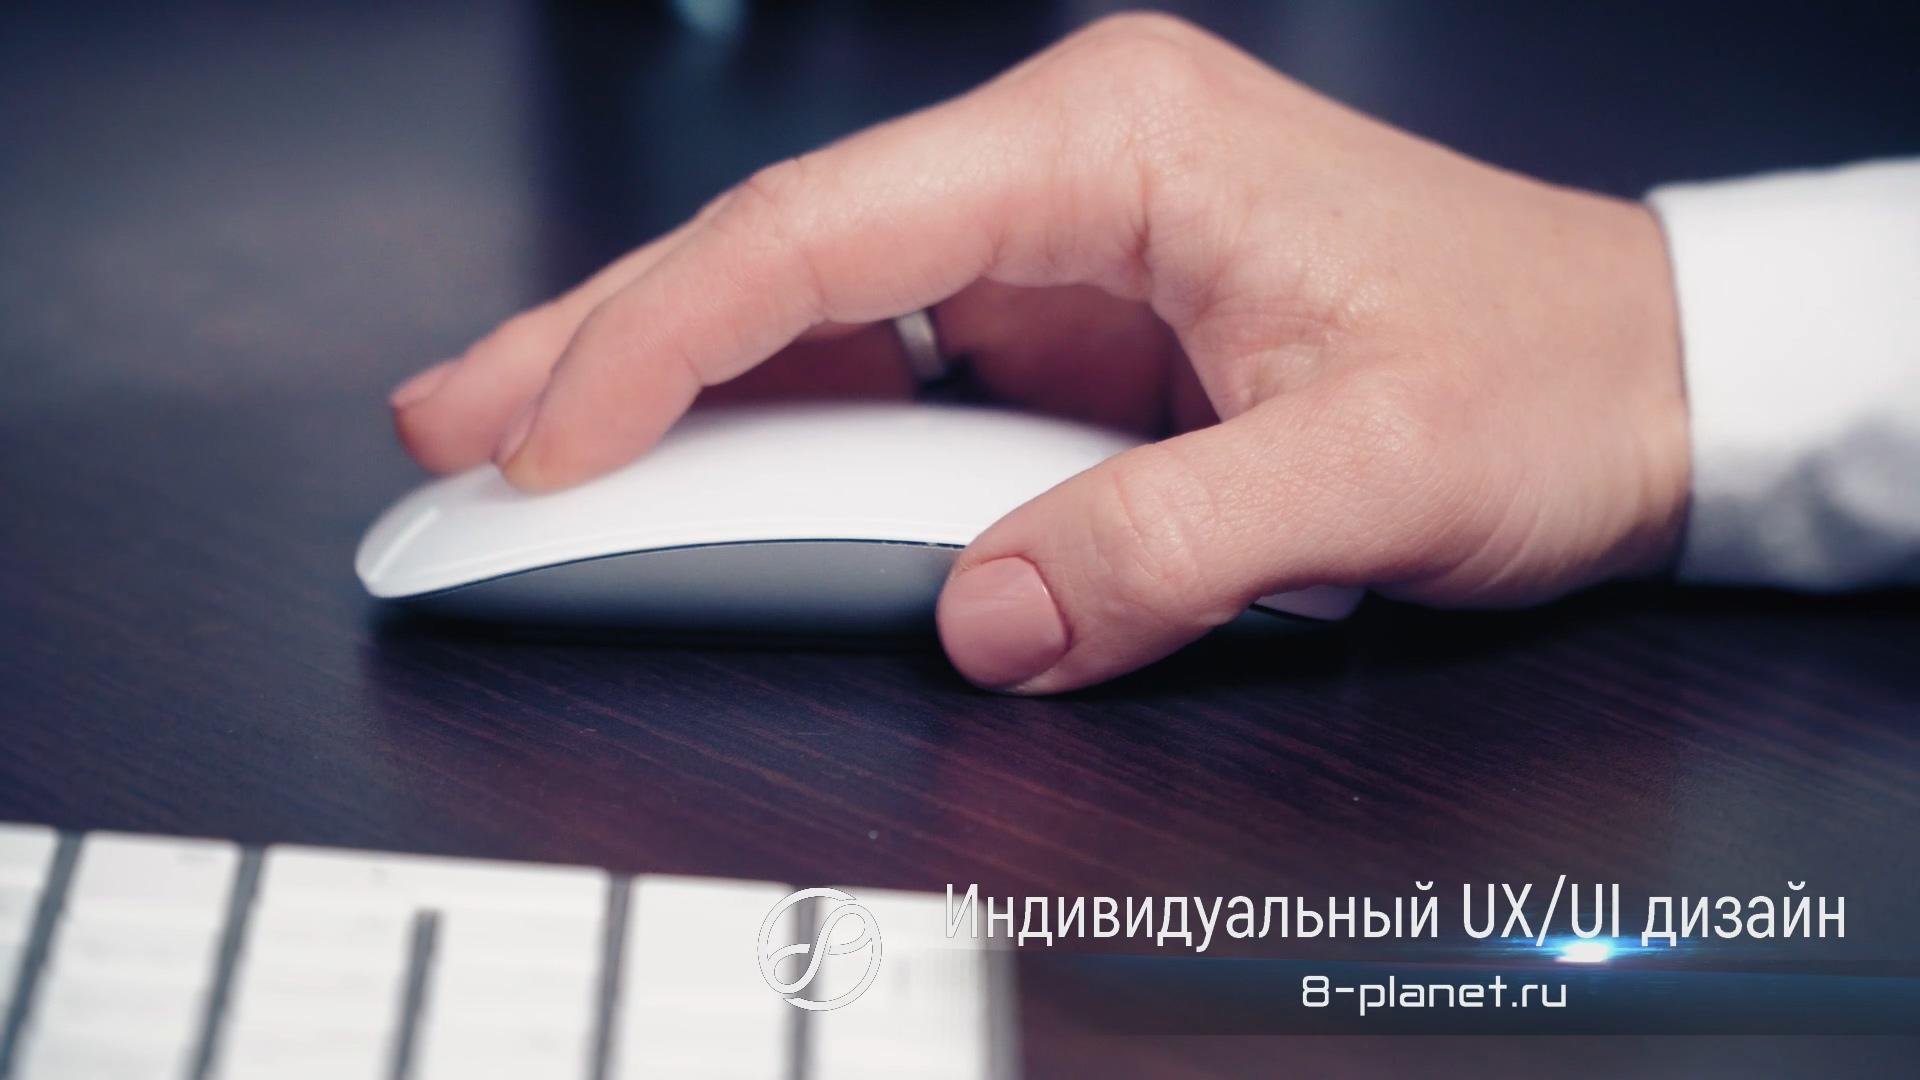 8planet_hand